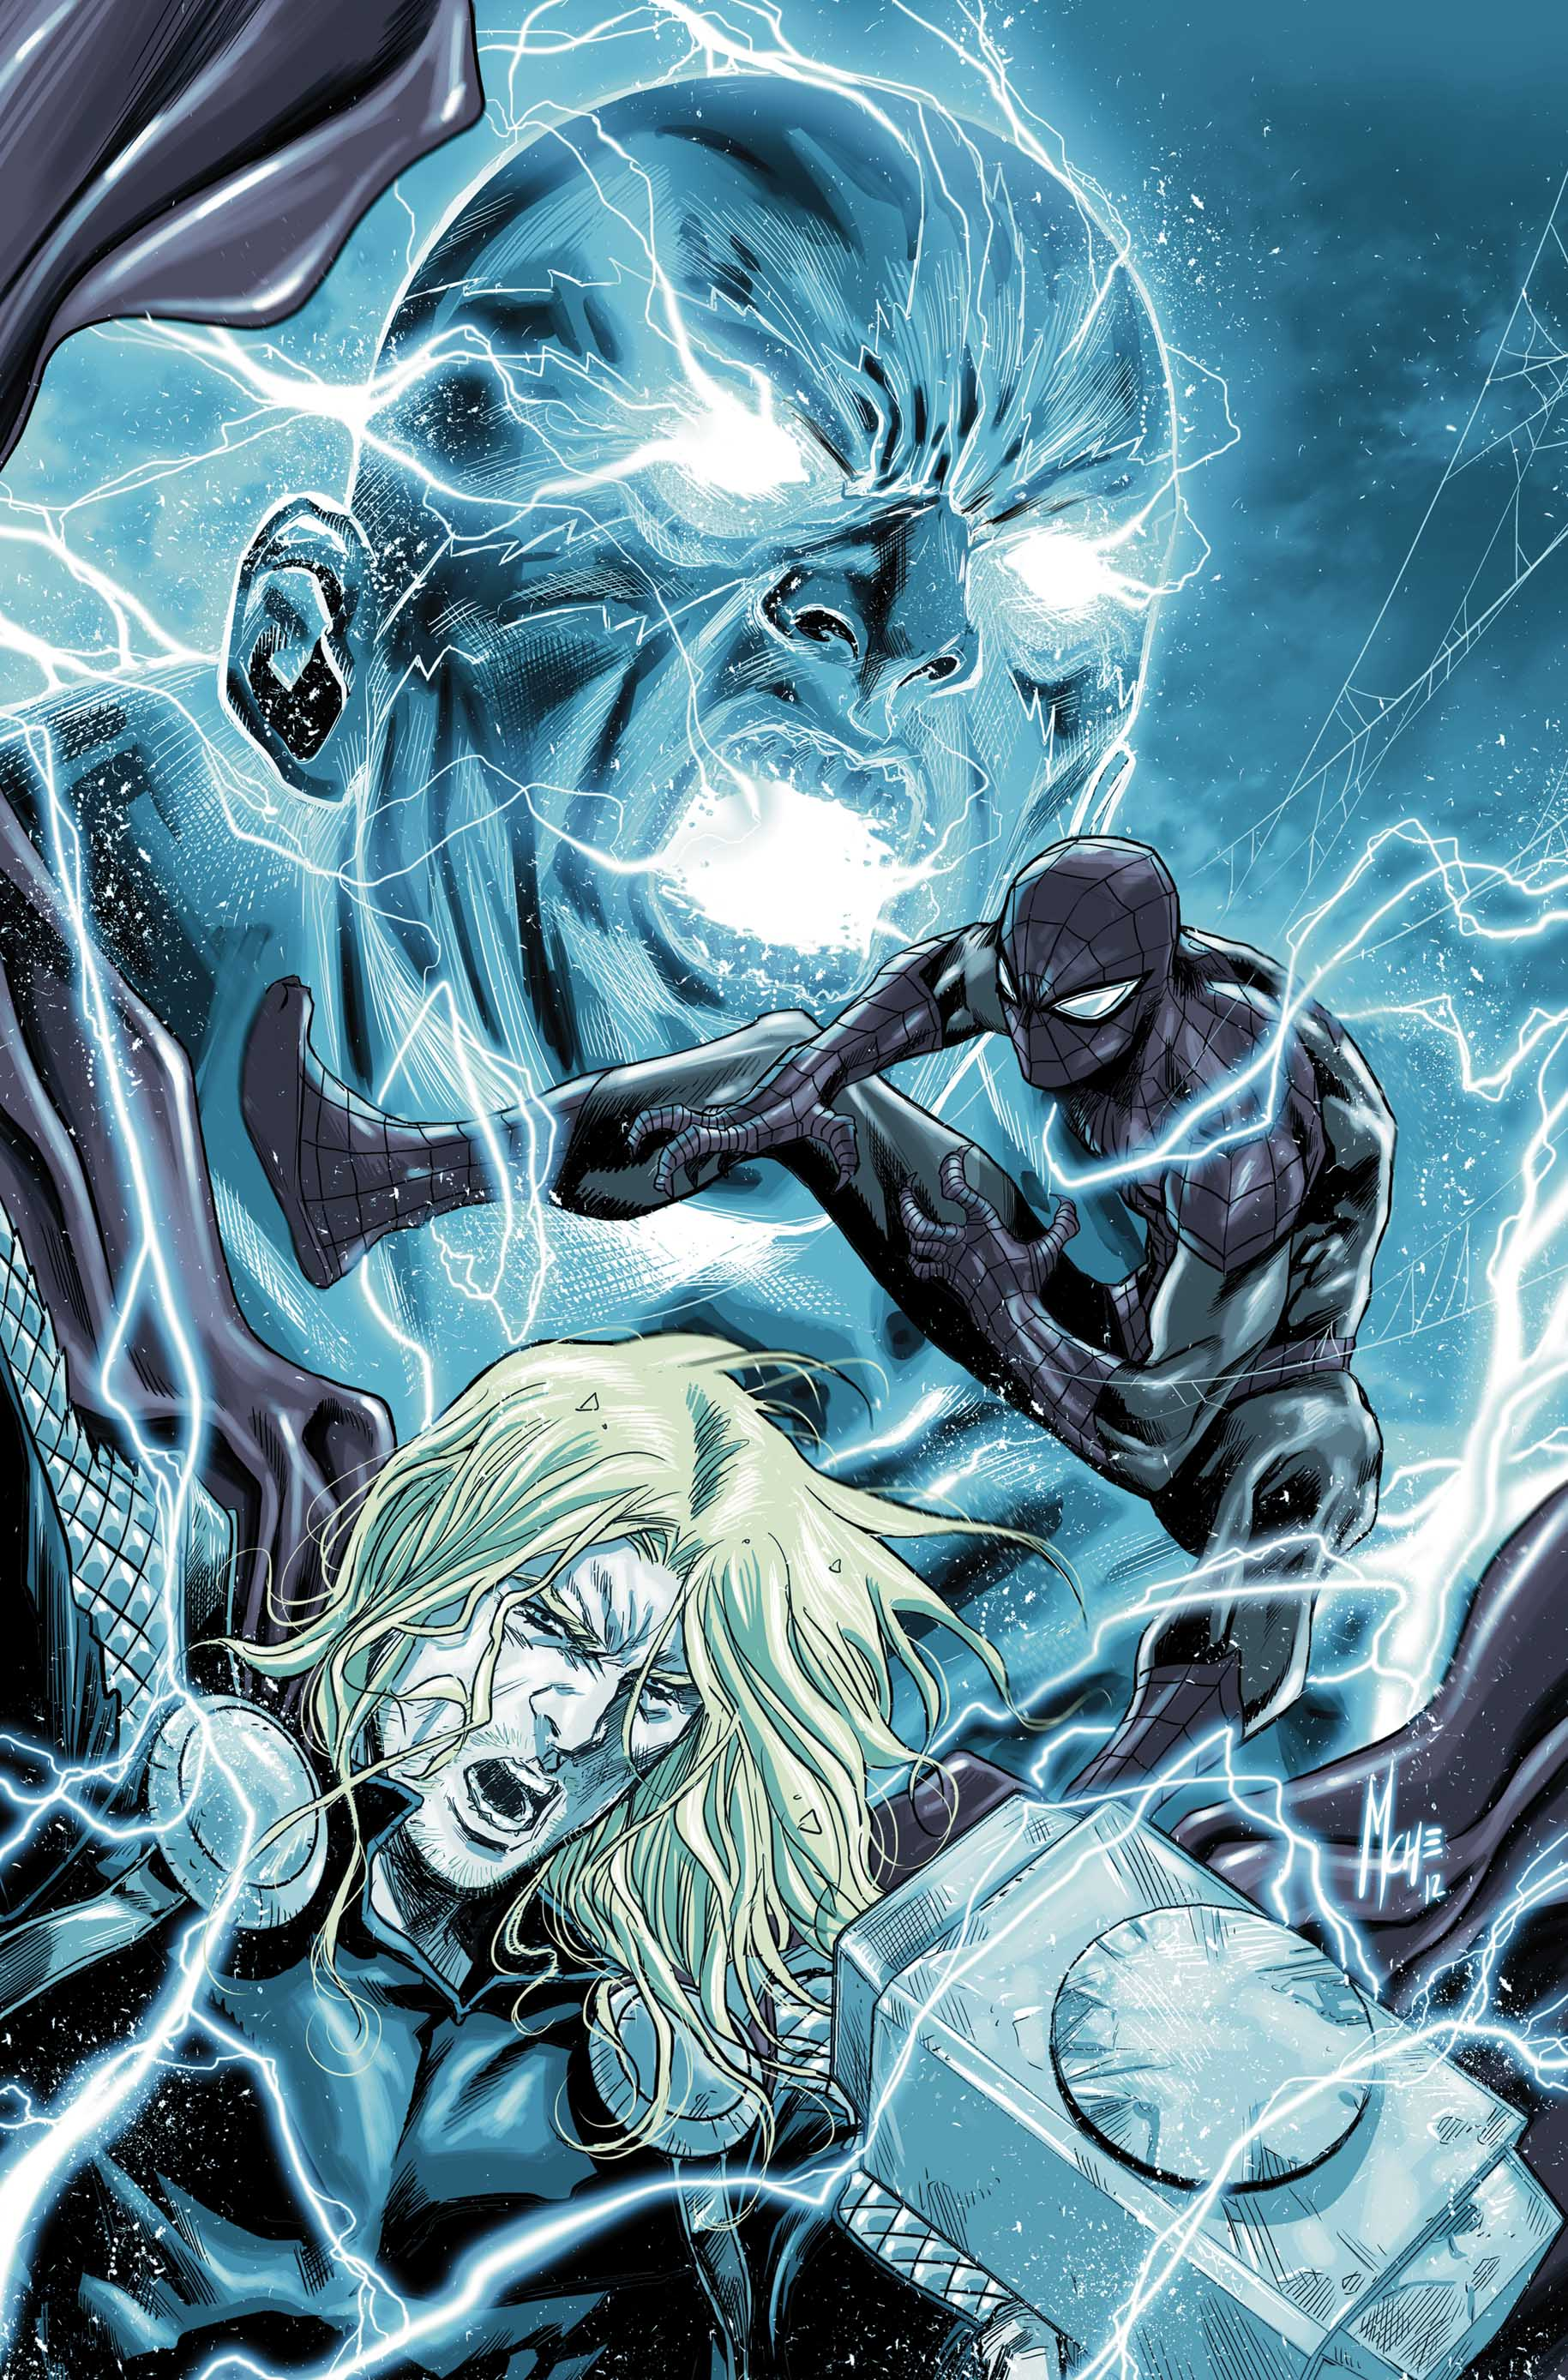 Avenging Spider-Man (2011) #18